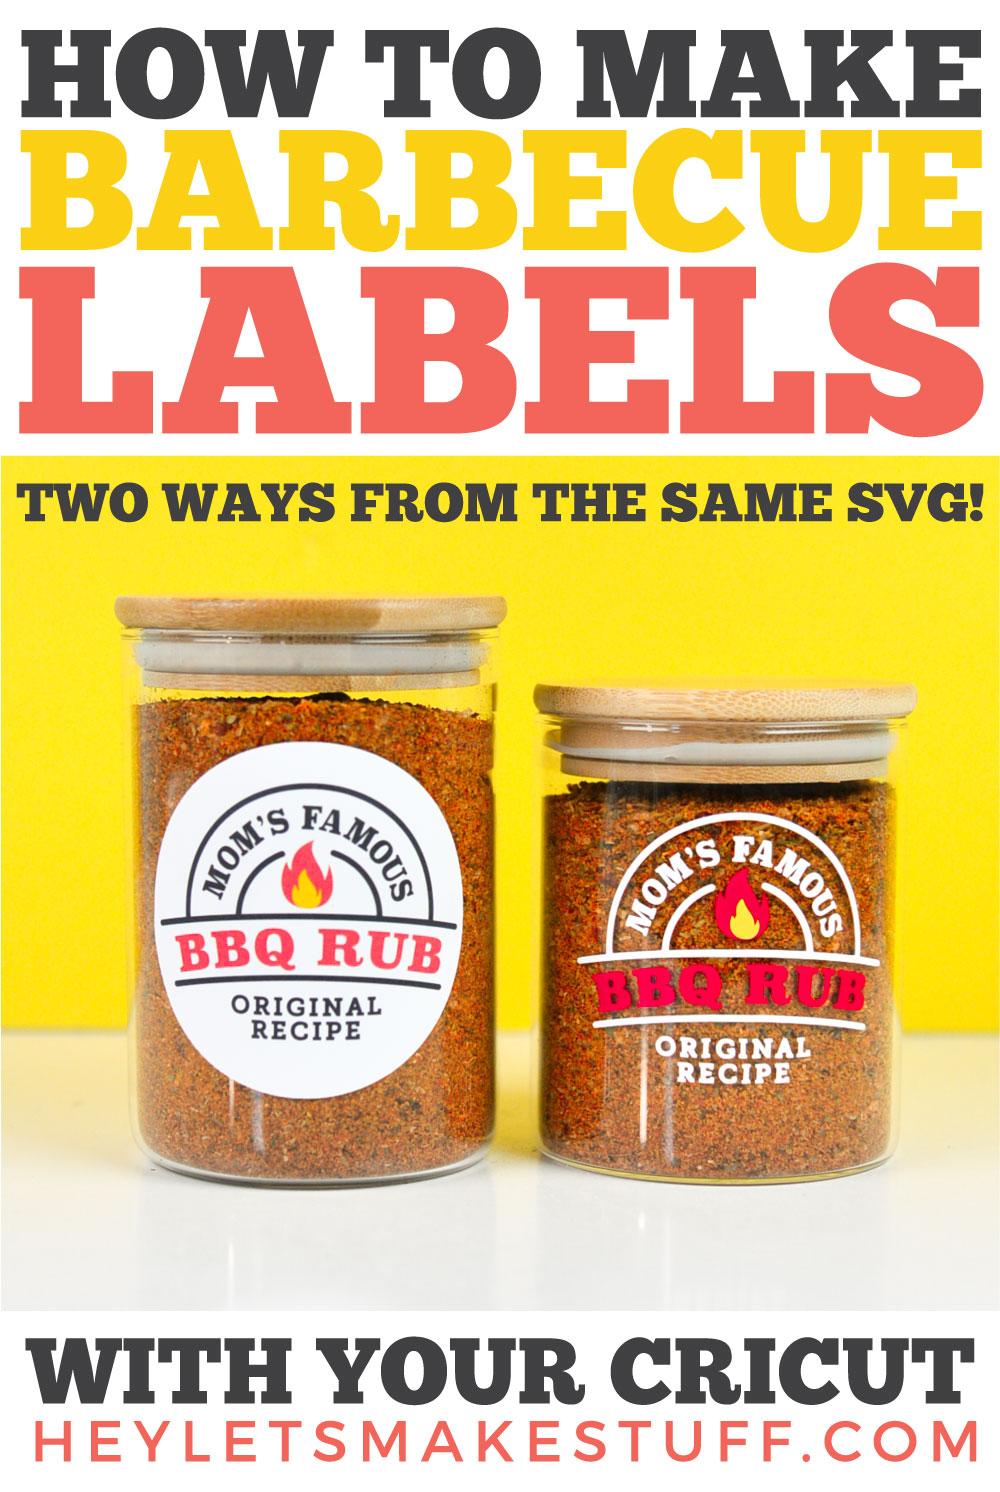 Cricut Barbecue Labels Pin Image